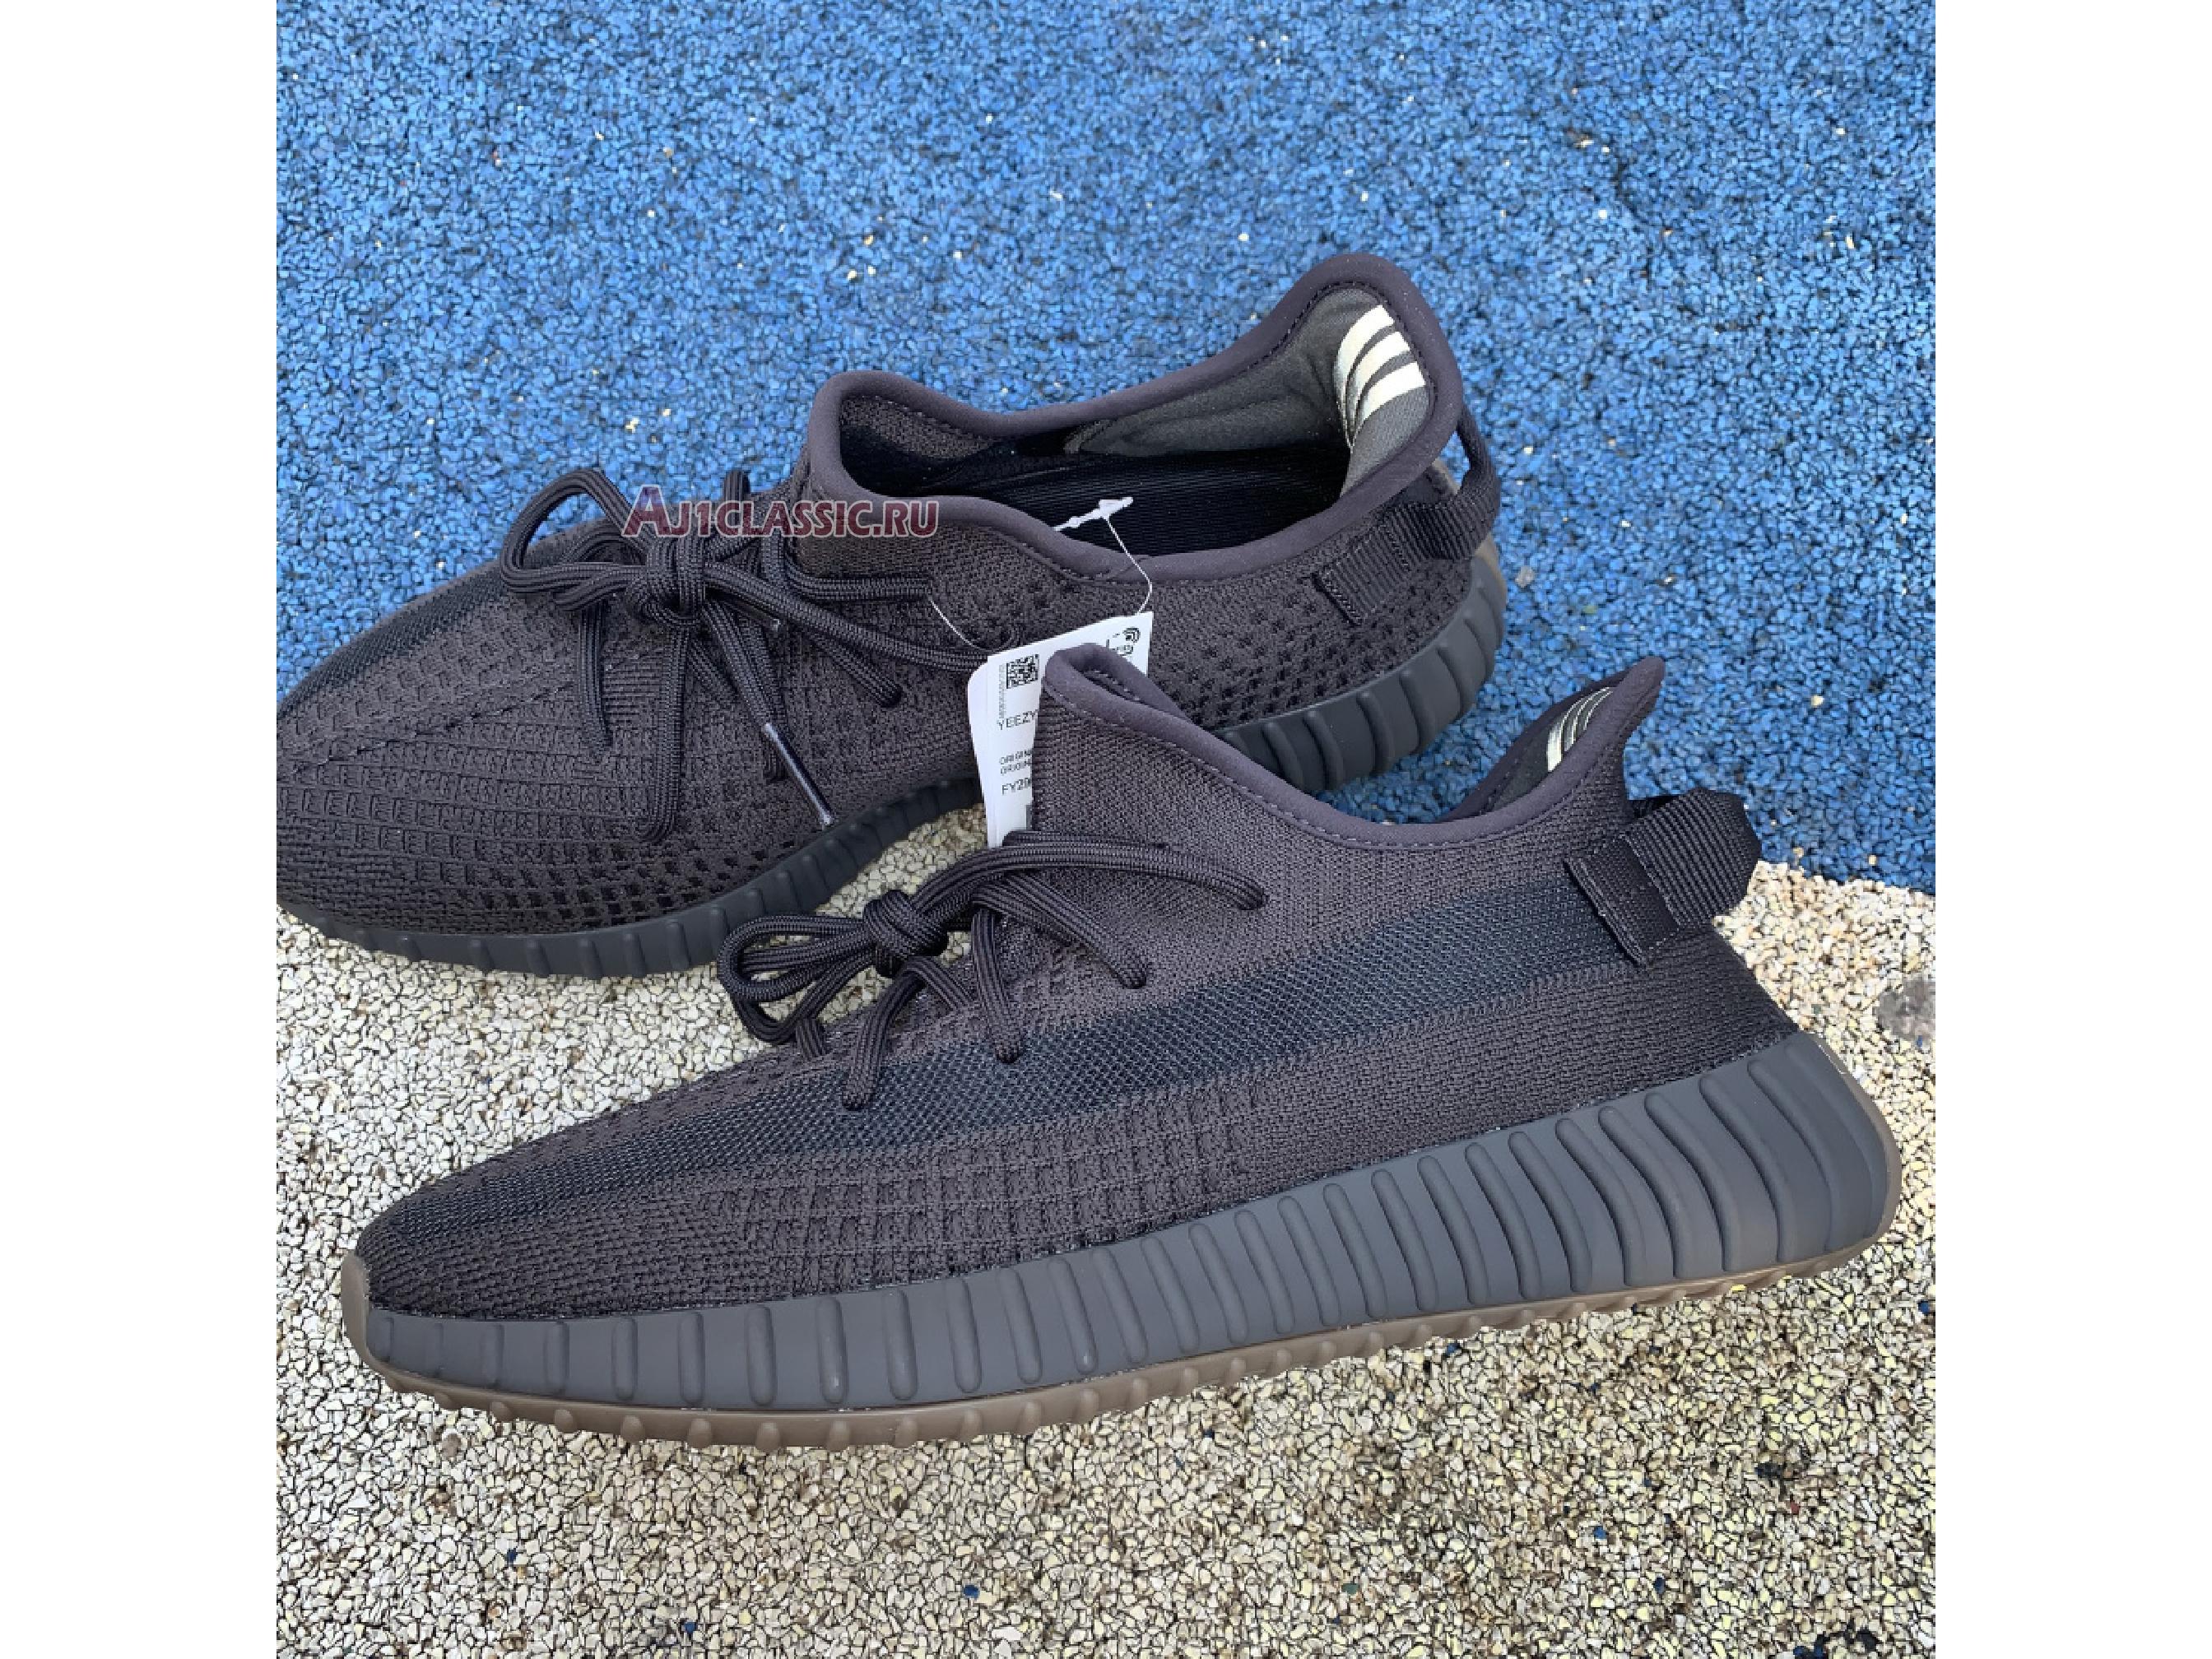 "Adidas Yeezy Boost 350 V2 ""Cinder Non-Reflective"" FY2903"